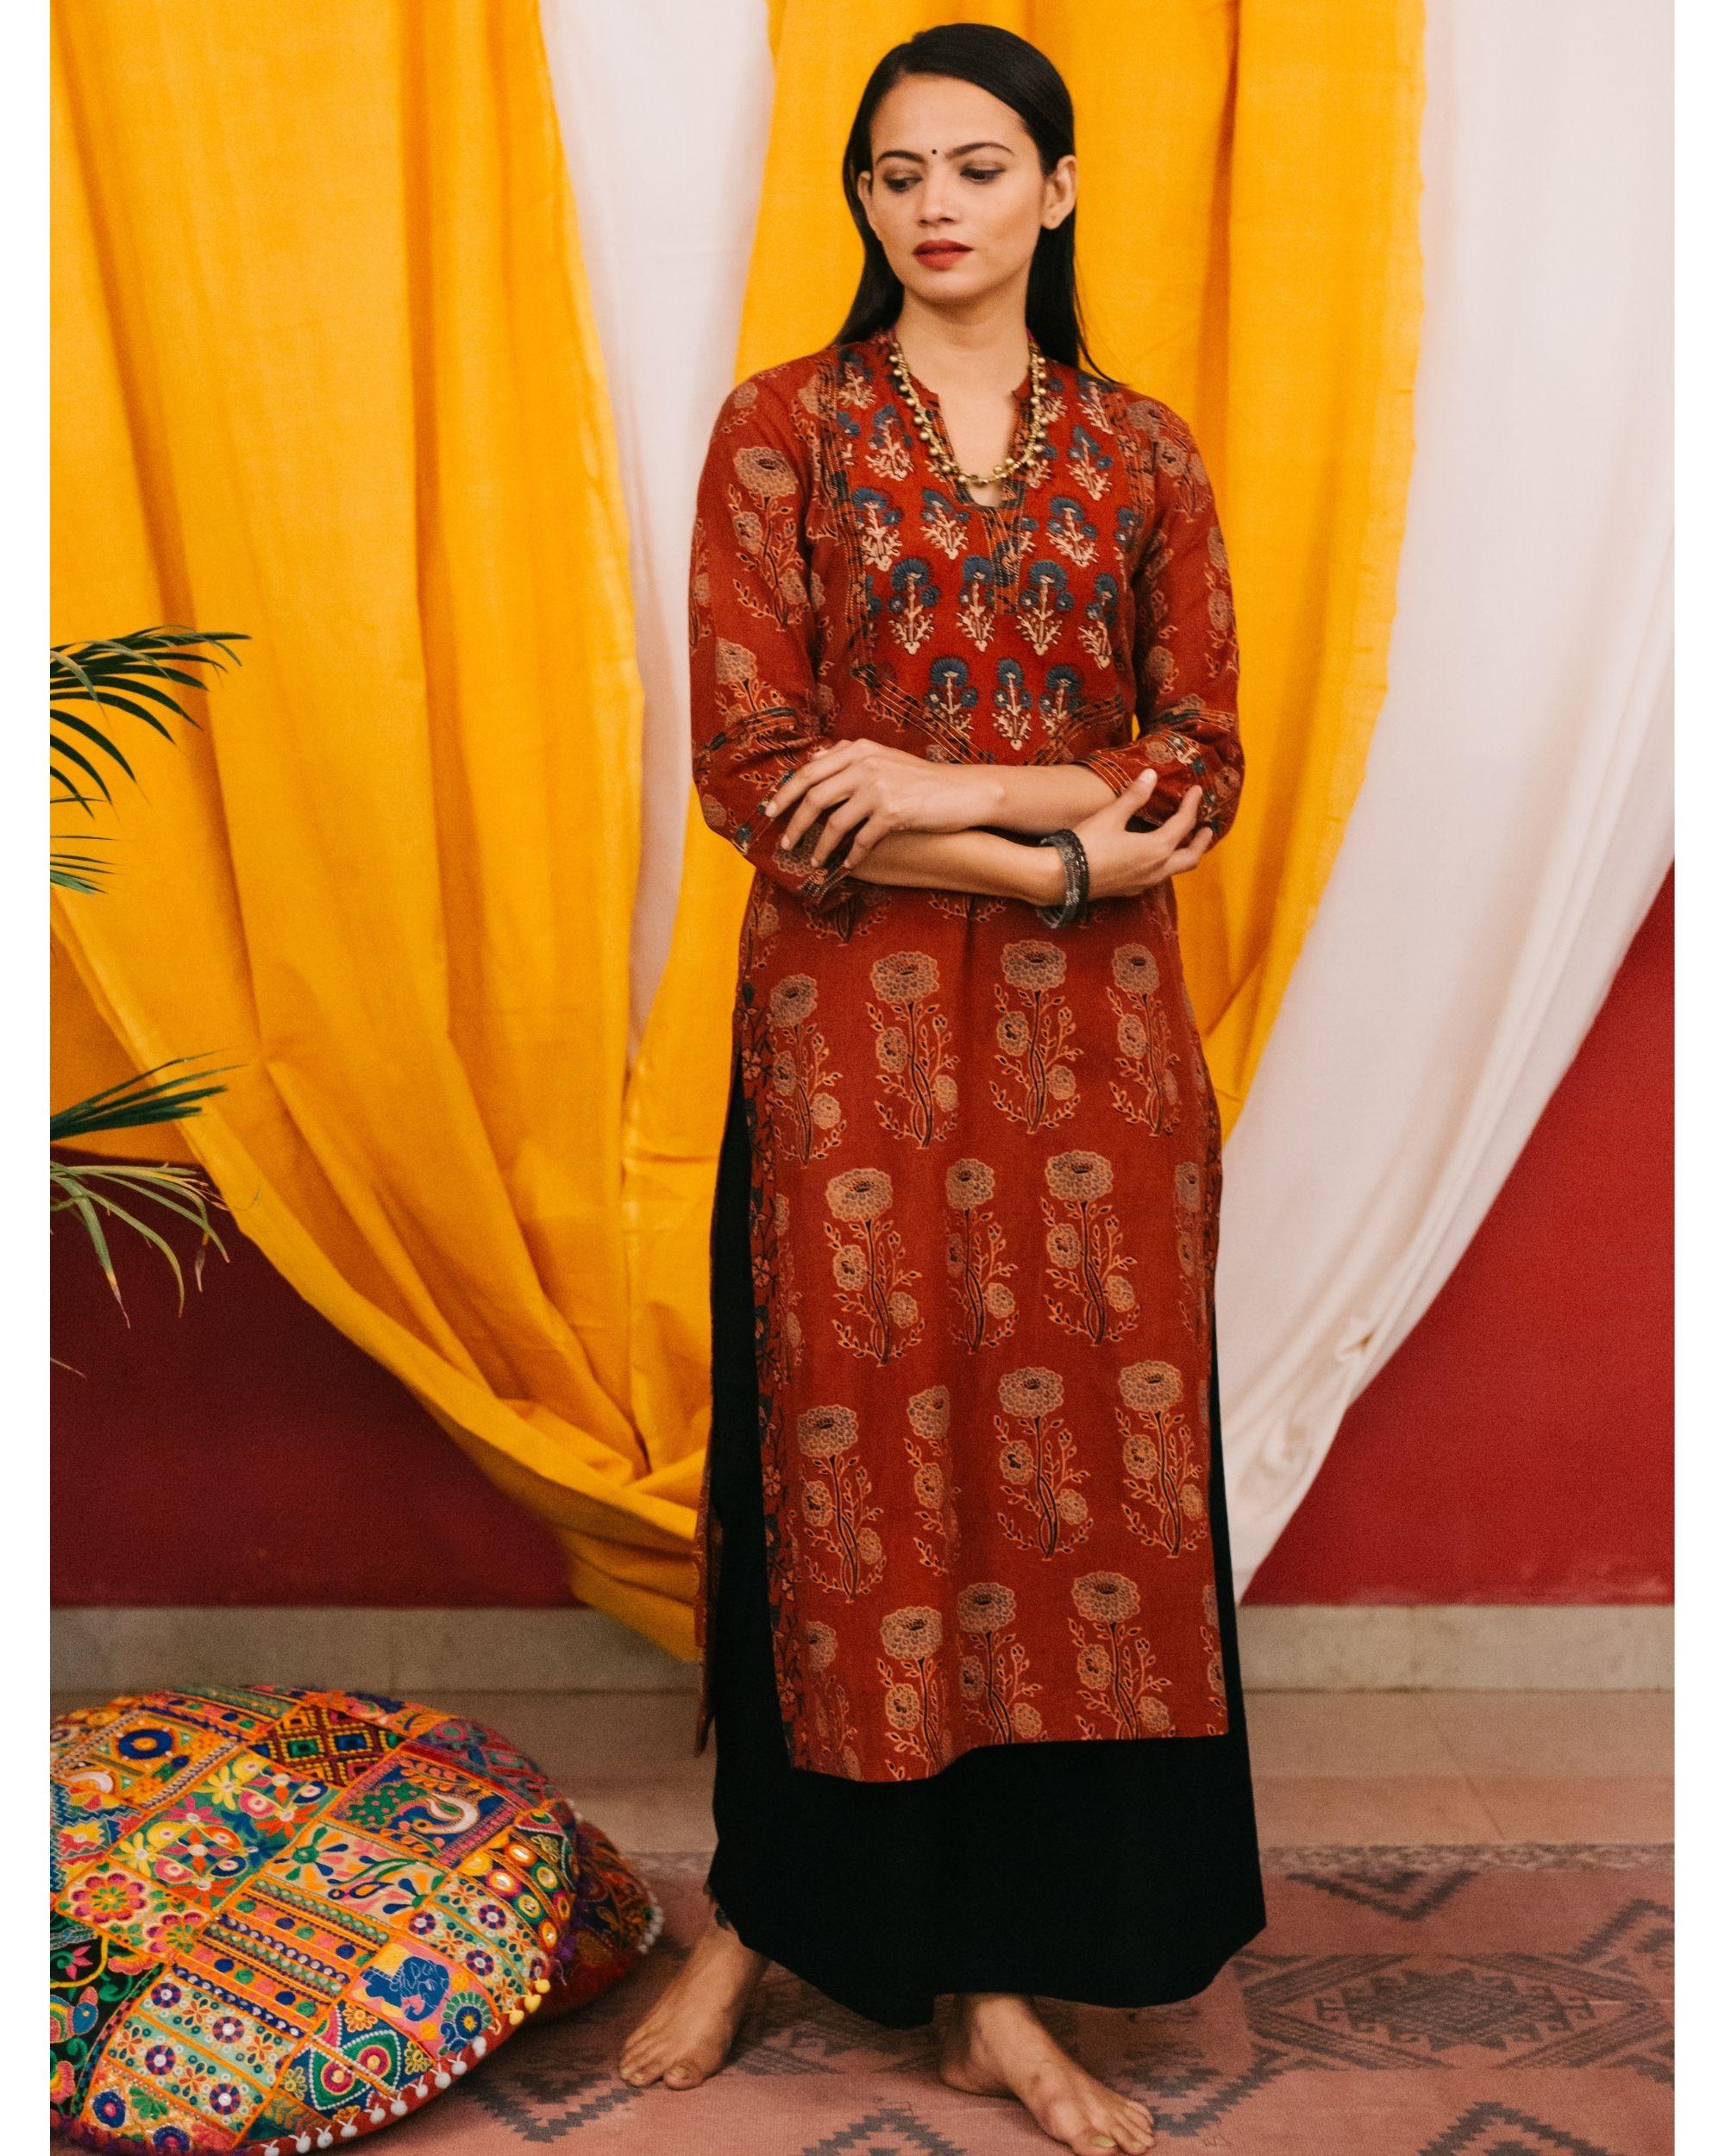 Red ajrakh boota kurta with yoke detailing and black palazzos - set of 2